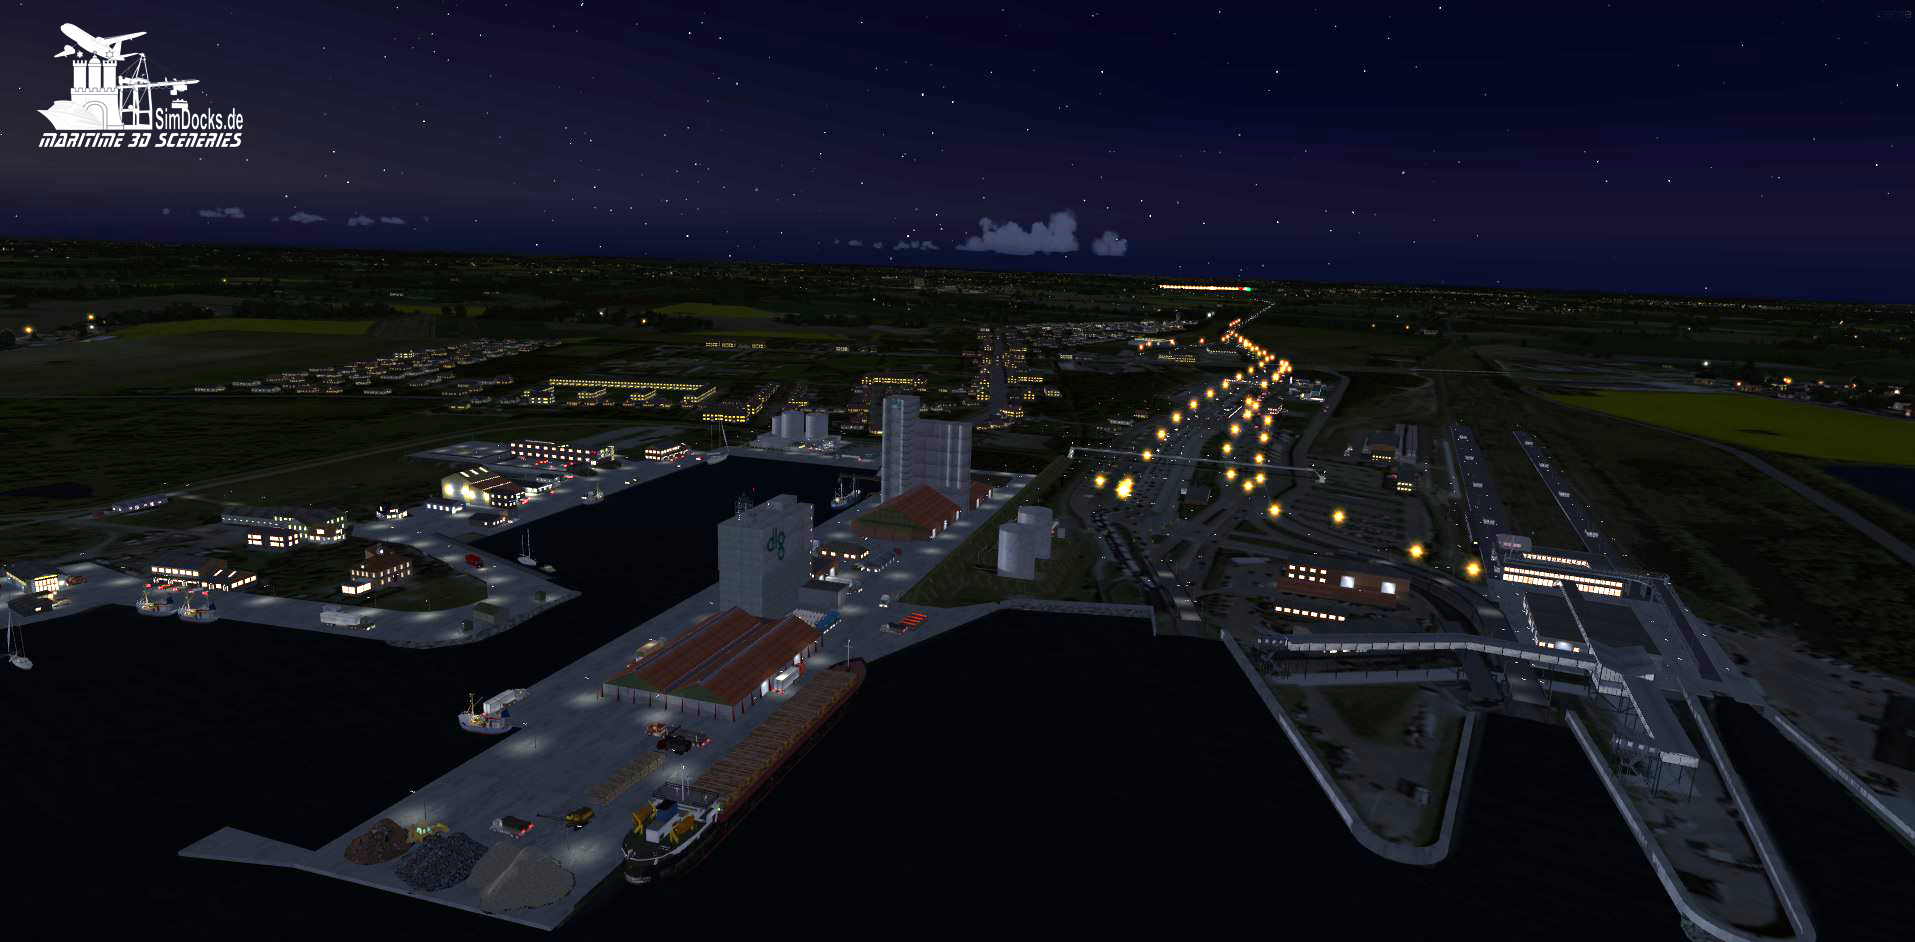 Rodbyhavn: